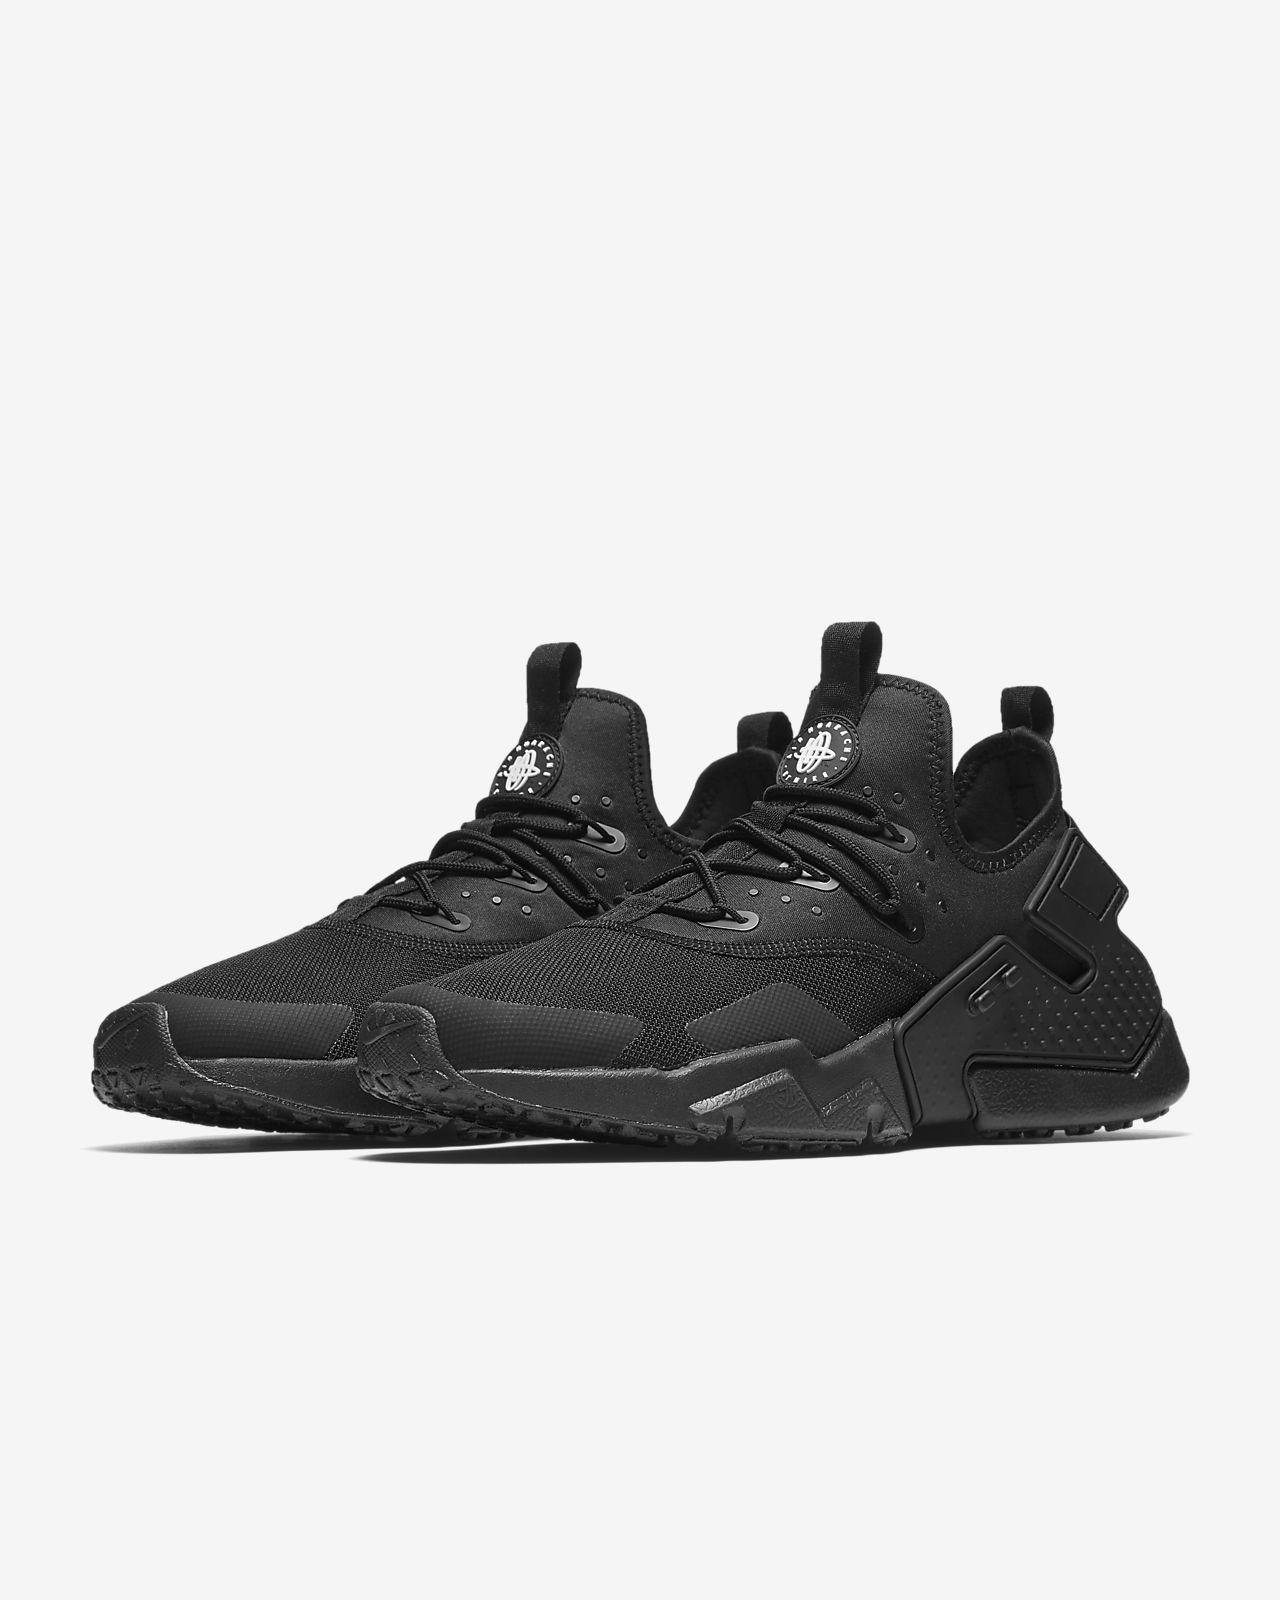 uk availability 5b2be c0376 Nike AIR HUARACHE DRIFT - CALZADO - Sneakers   Deportivas